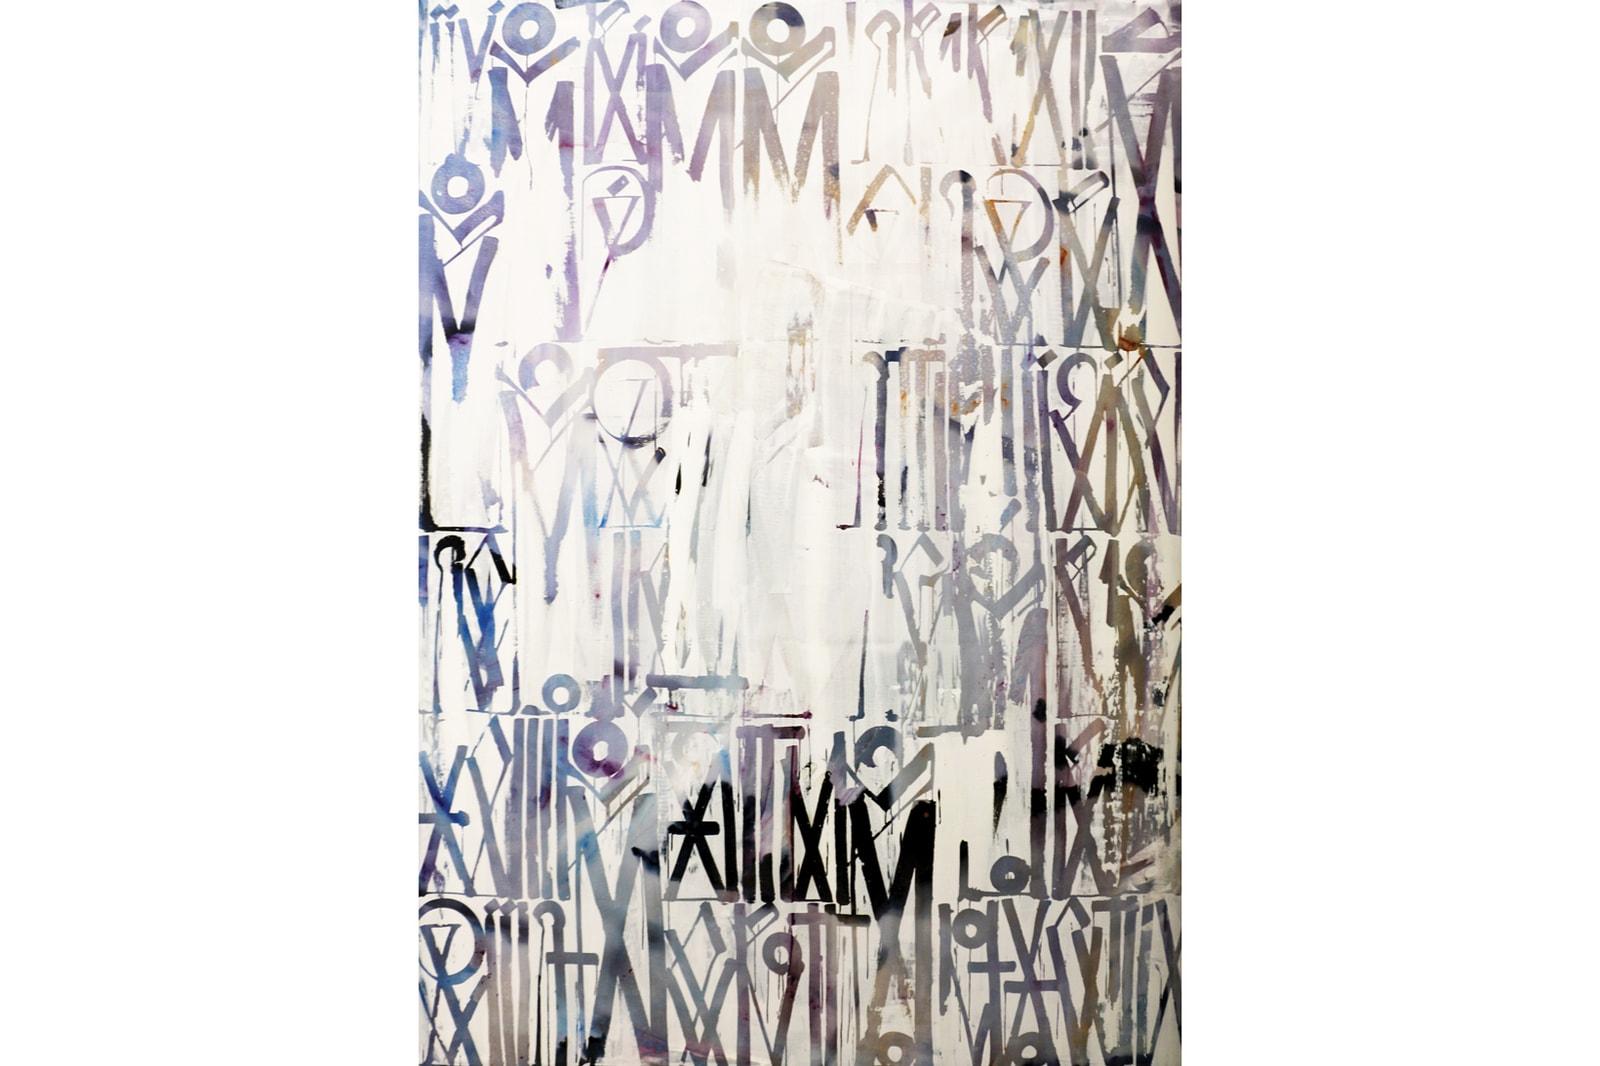 RETNA Margraves Solo Exhibition Maddox Gallery London United Kingdom Art Artwork Graffiti Calligraphy